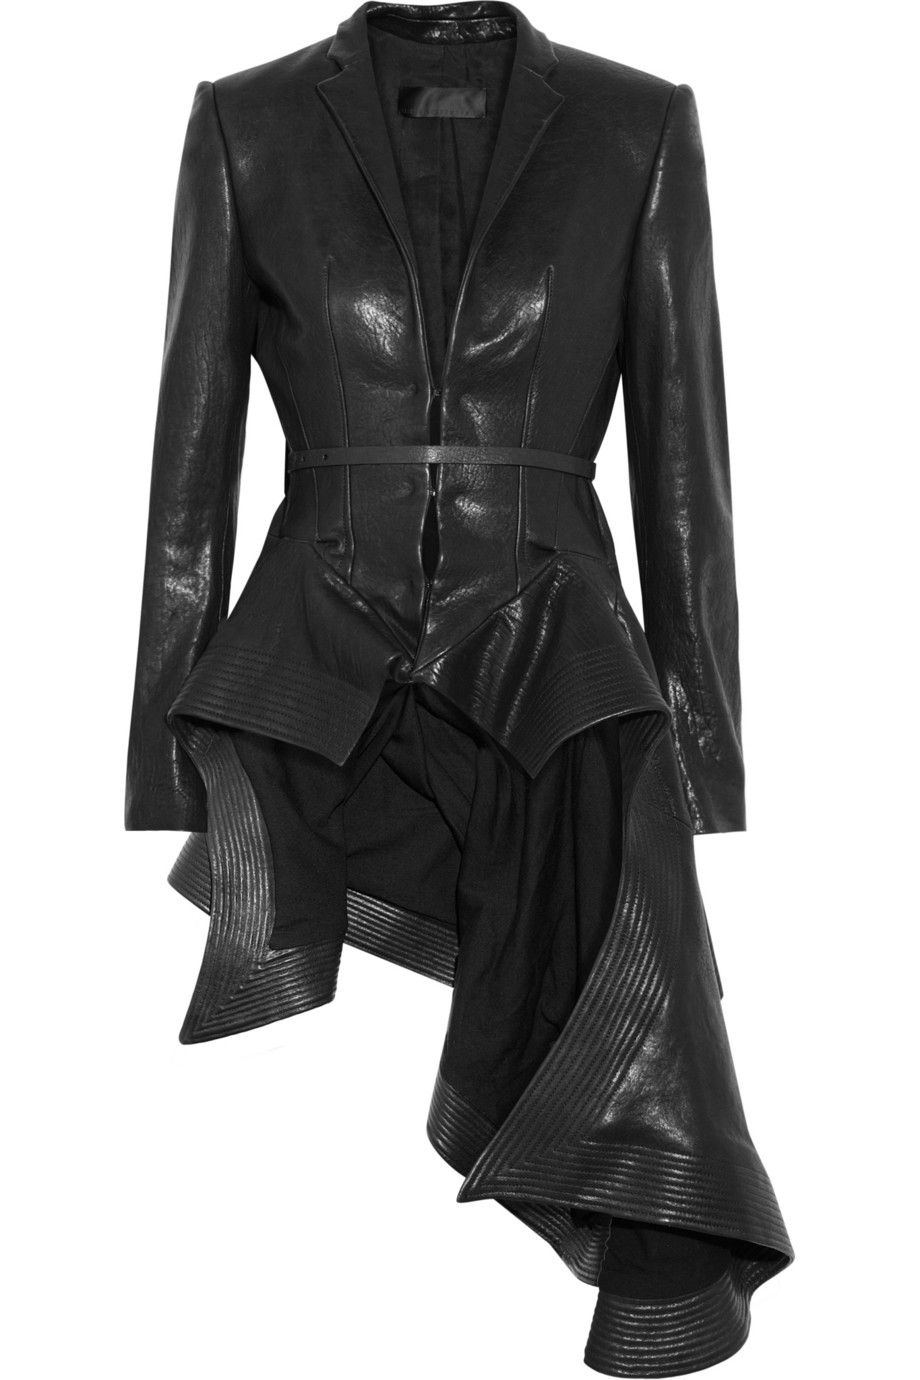 Haider Ackermann - Black Origami Leather Jacket - Lyst